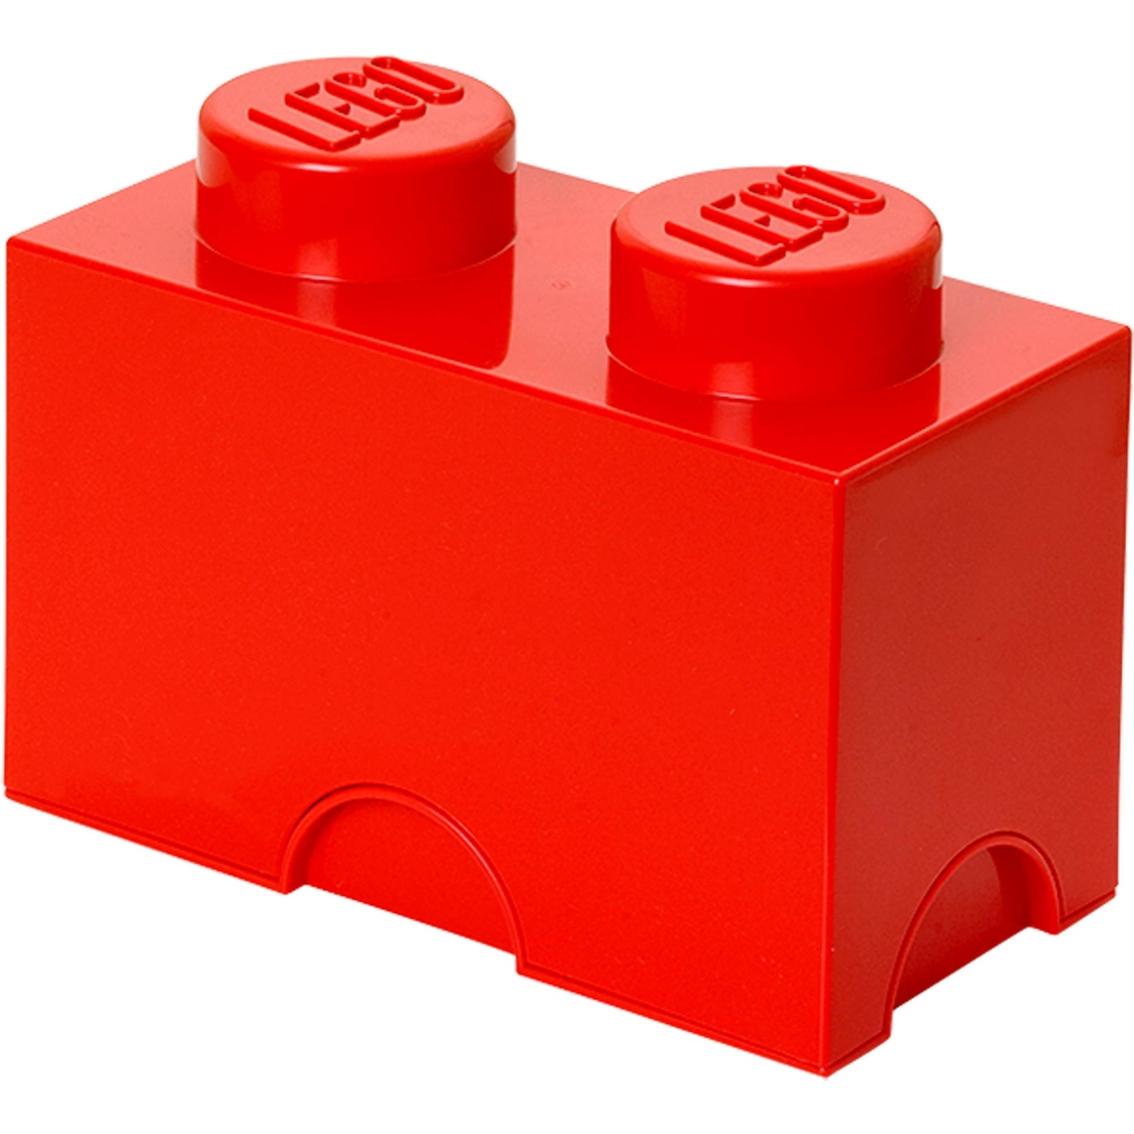 1134x1134 Lego Bricks Amp More Rectangular Storage Brick 2 Lego Bricks